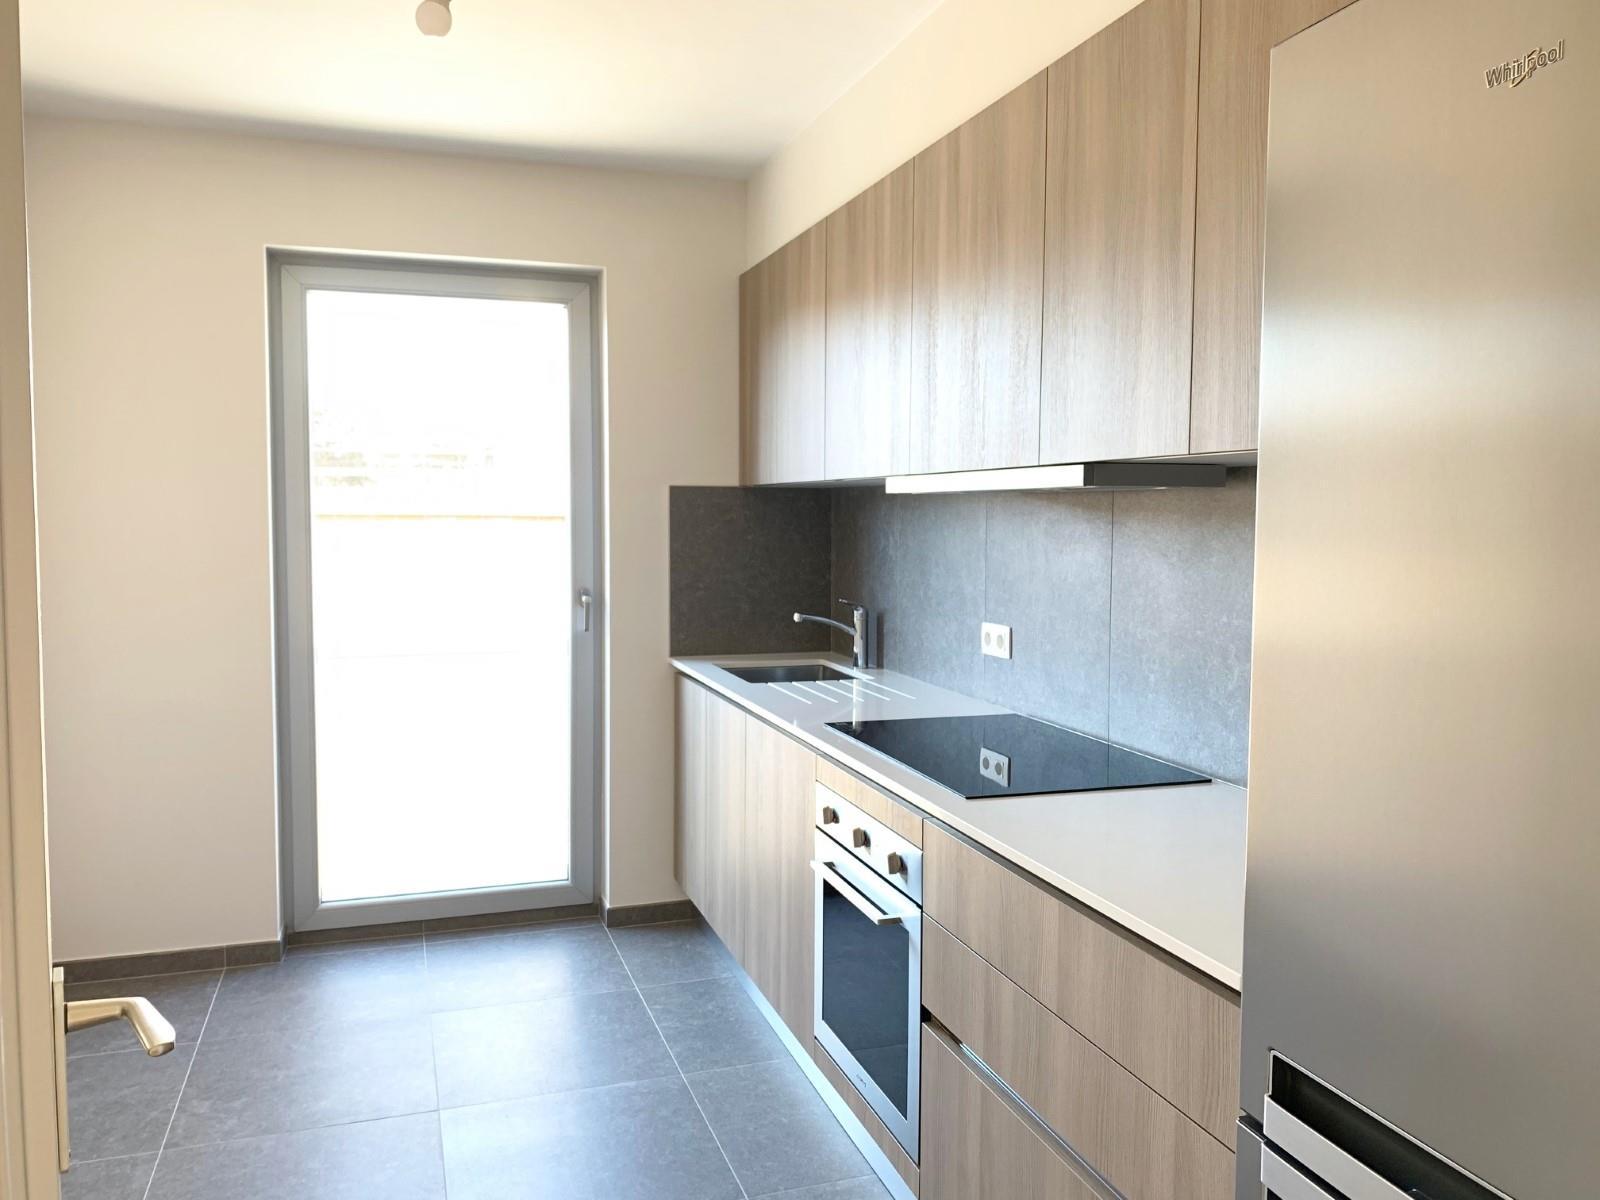 Duplex - Woluwe-Saint-Lambert - #3798385-3